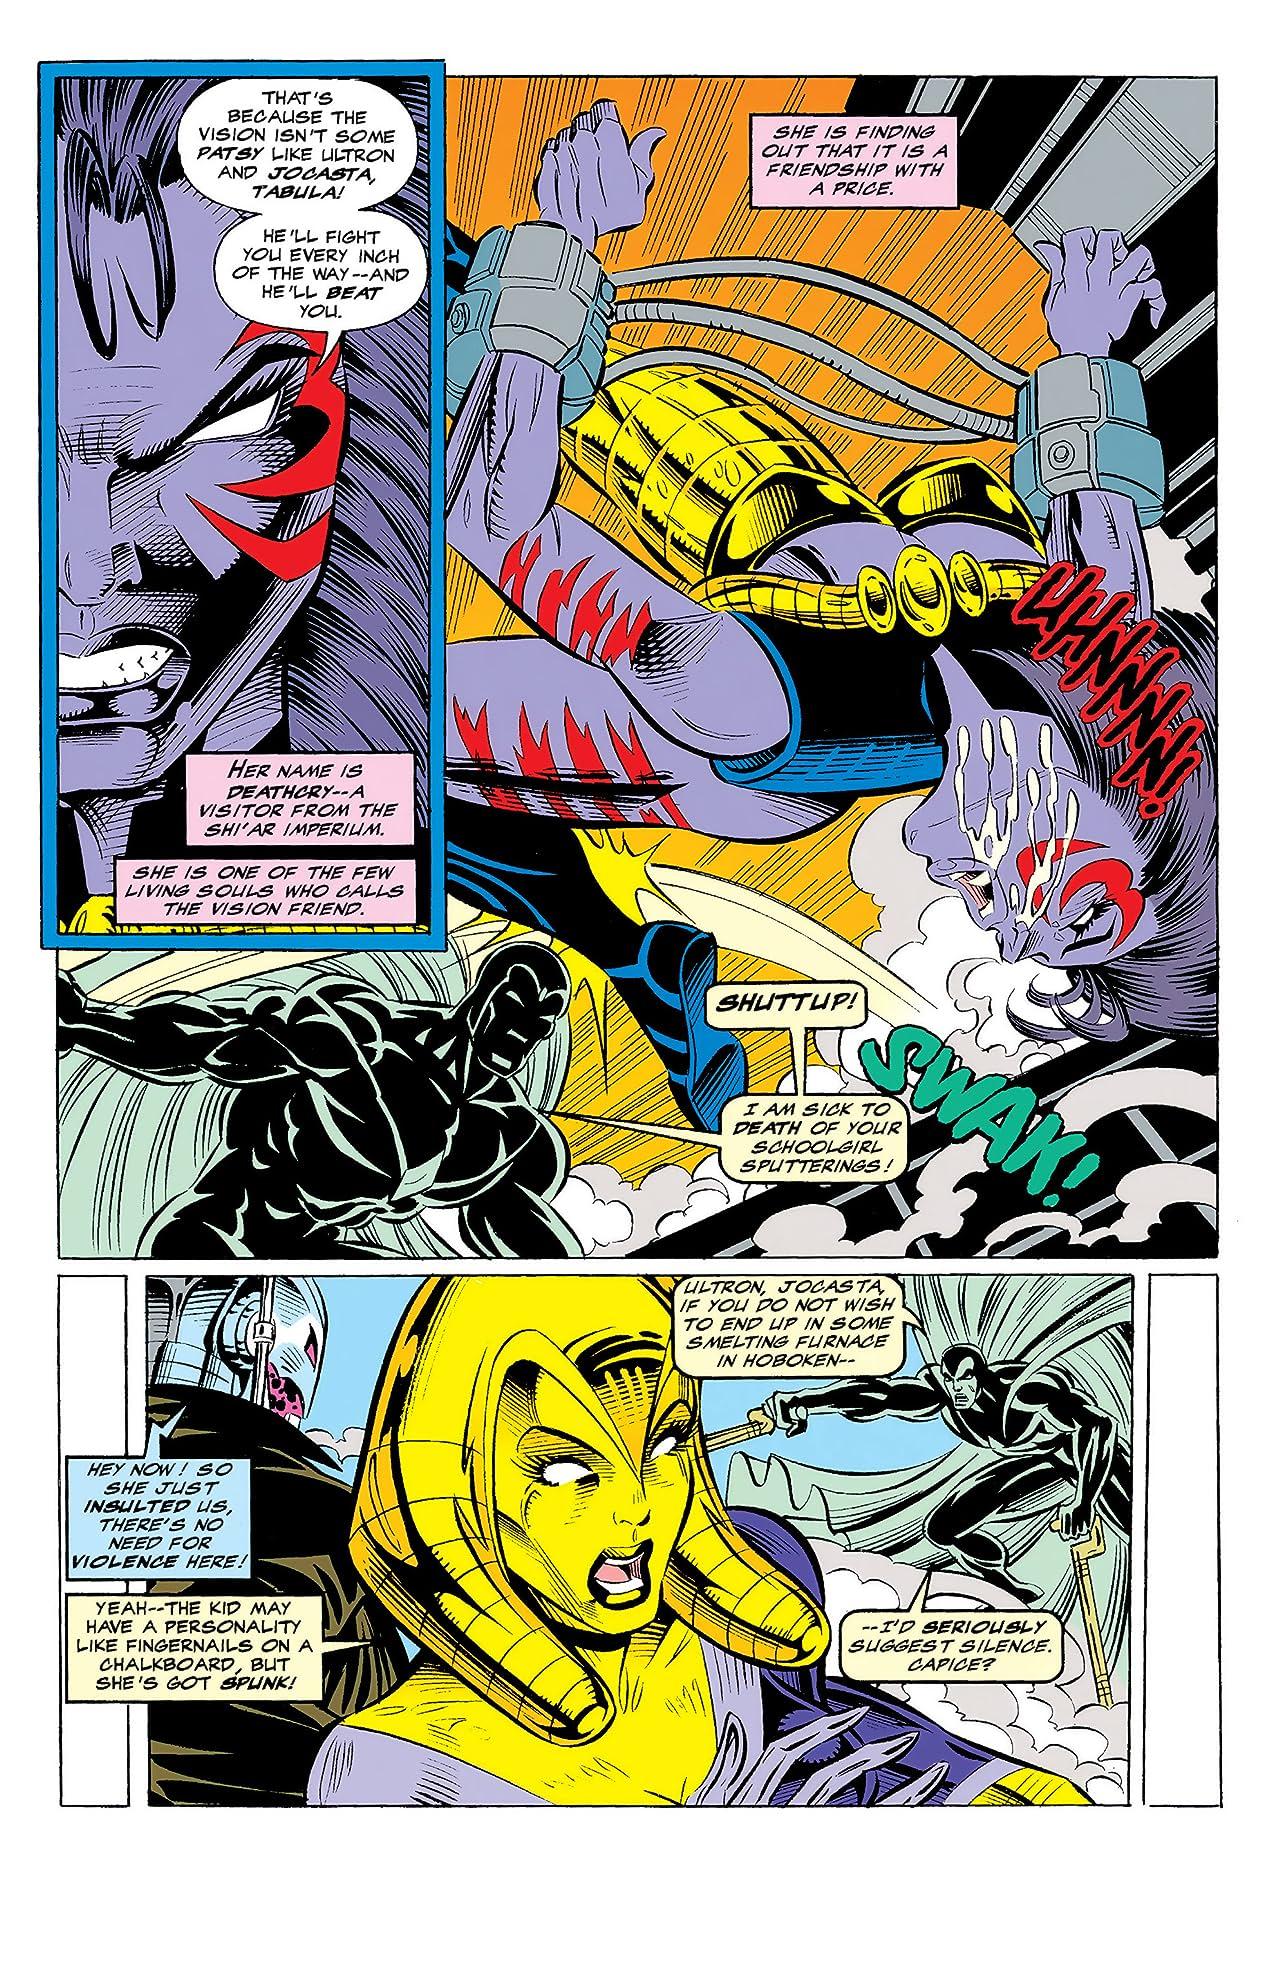 Vision (1994) #4